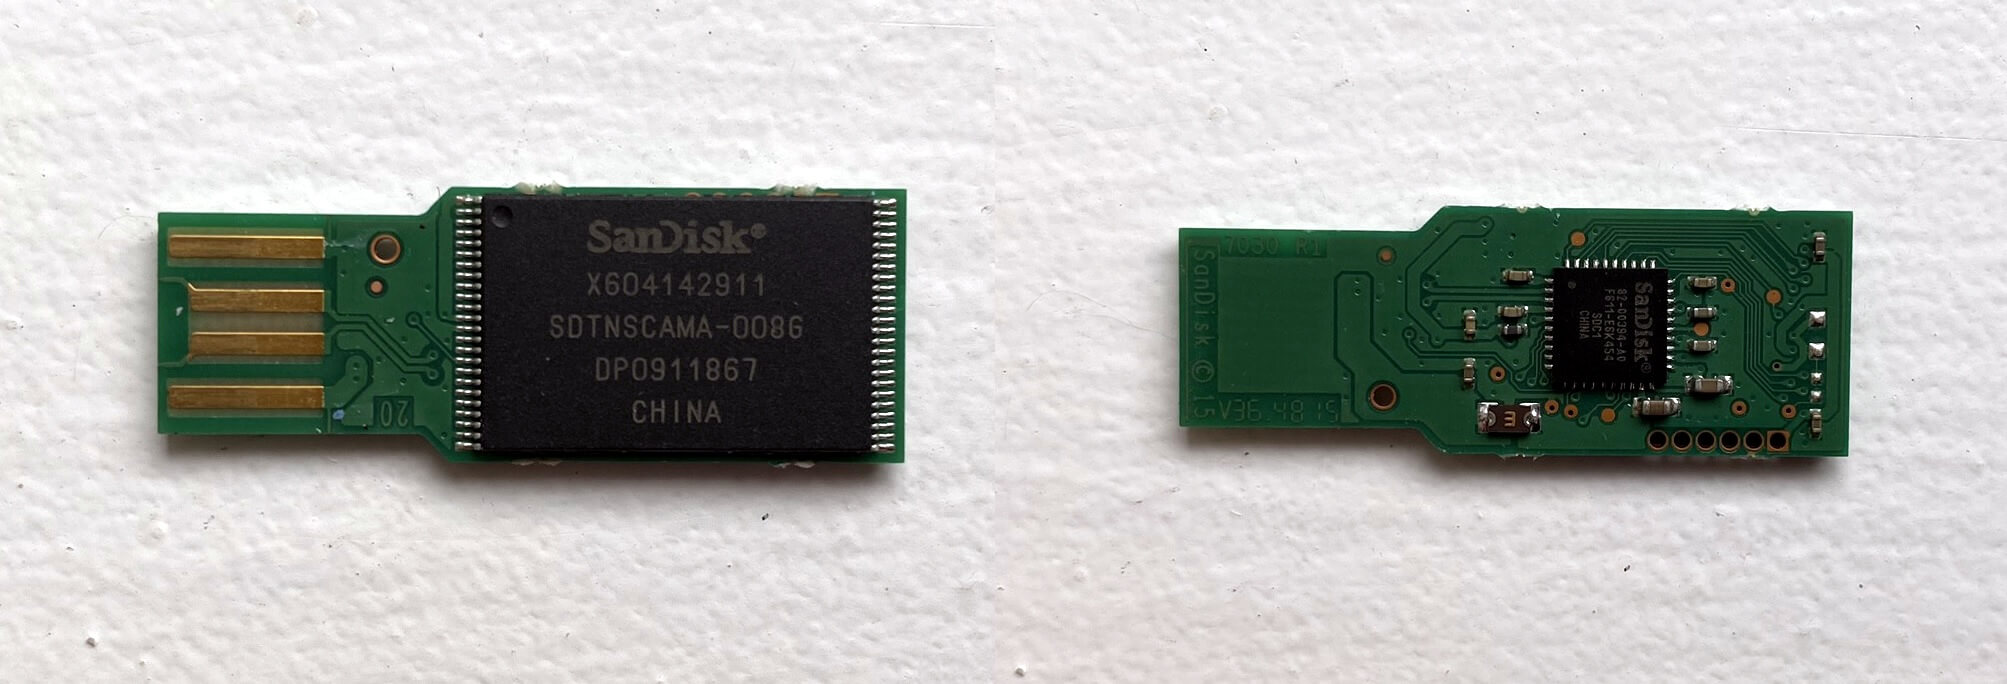 Анатомия накопителей: SSD - 2